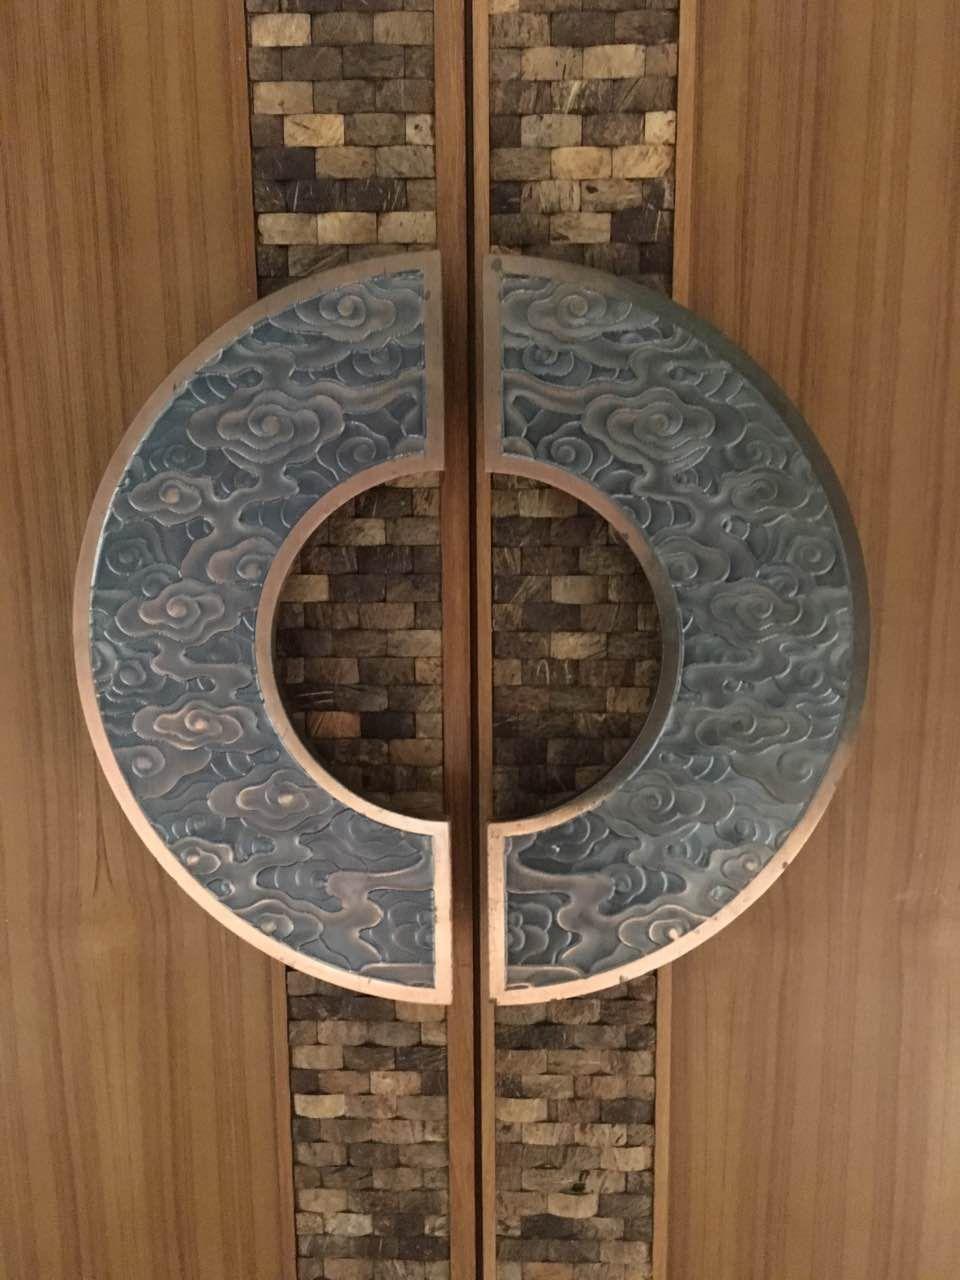 Pin by anubhav vatsal on indulge the art pinterest doors door